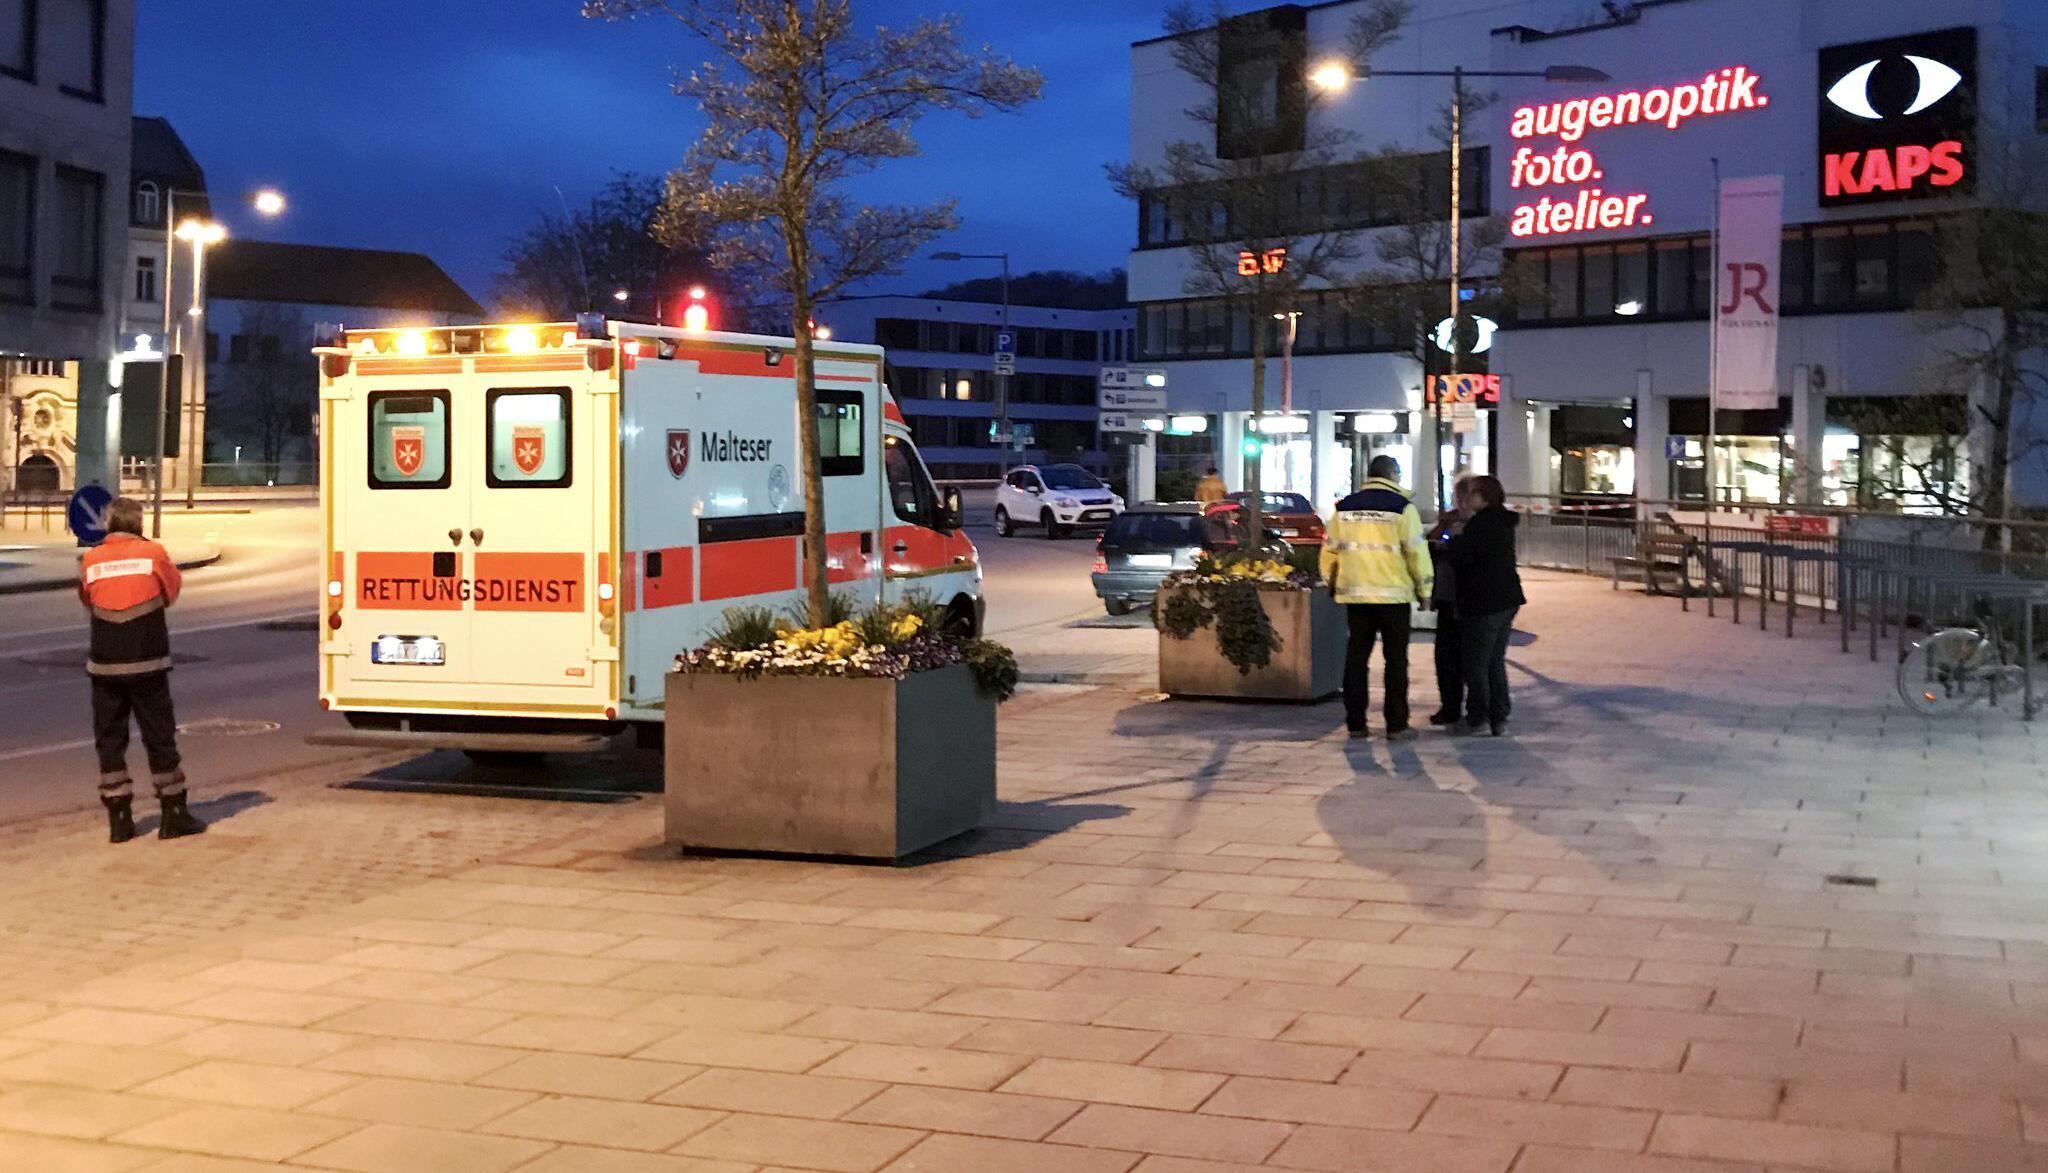 Bild zu Passau, 15-Jähriger, Schlägerei, tot